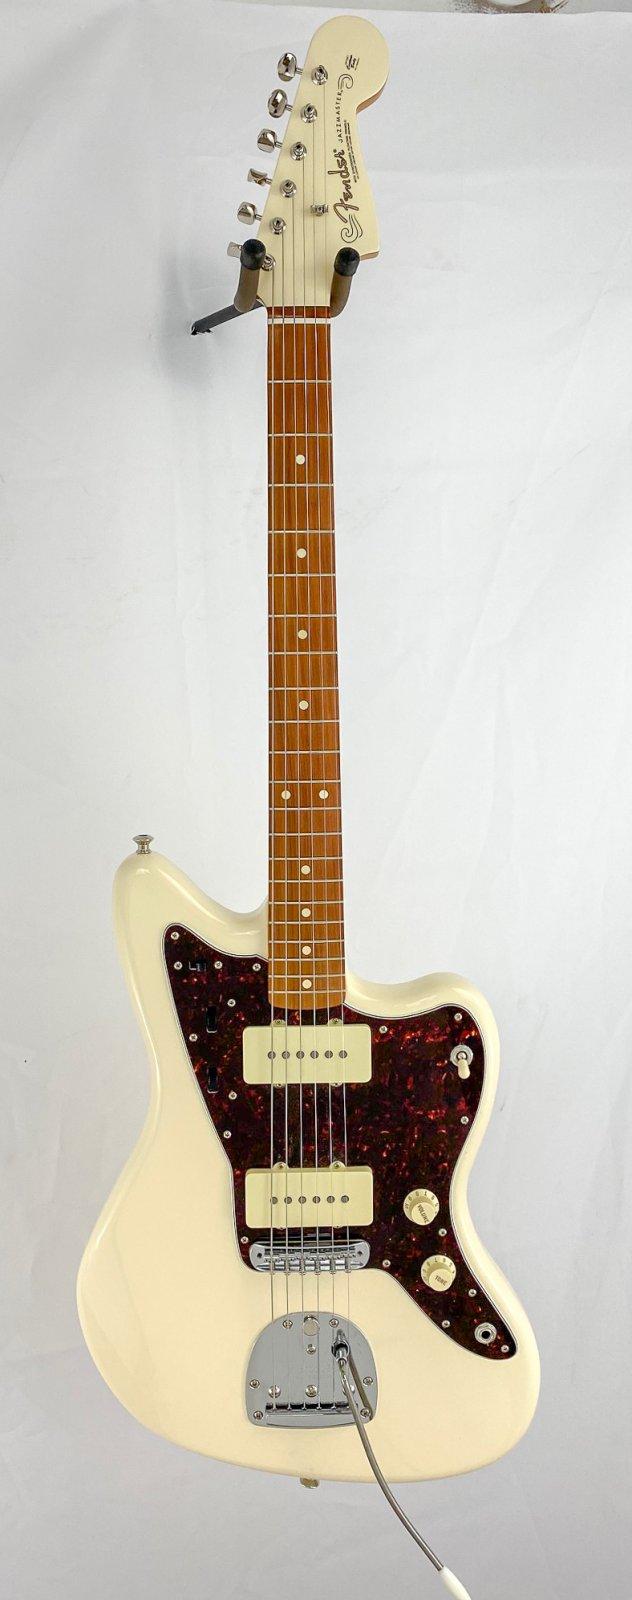 2019 Fender Vintera 60s Jazzmaster - w/gigbag